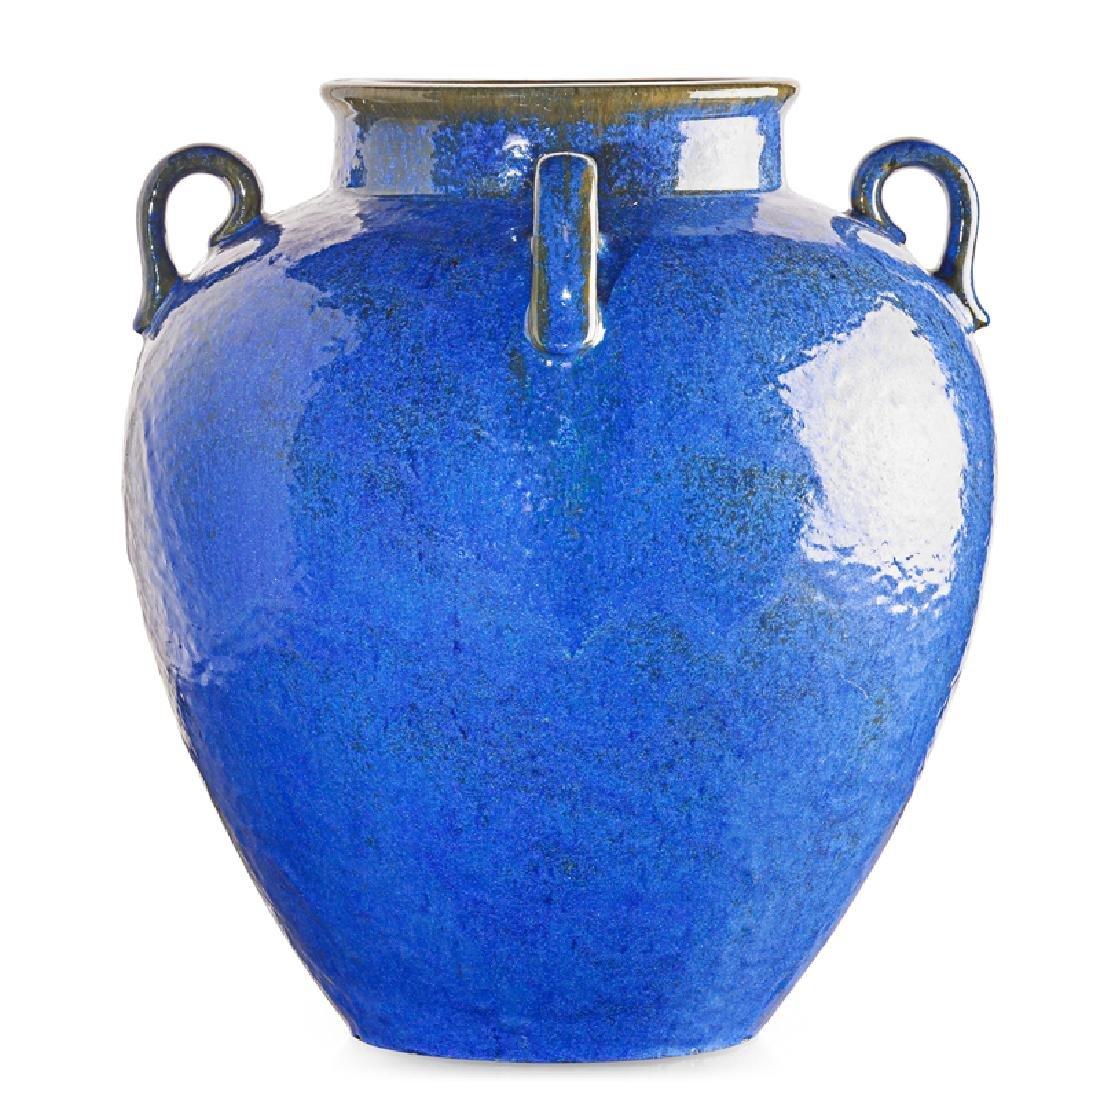 FULPER Large Venetian Blue vase